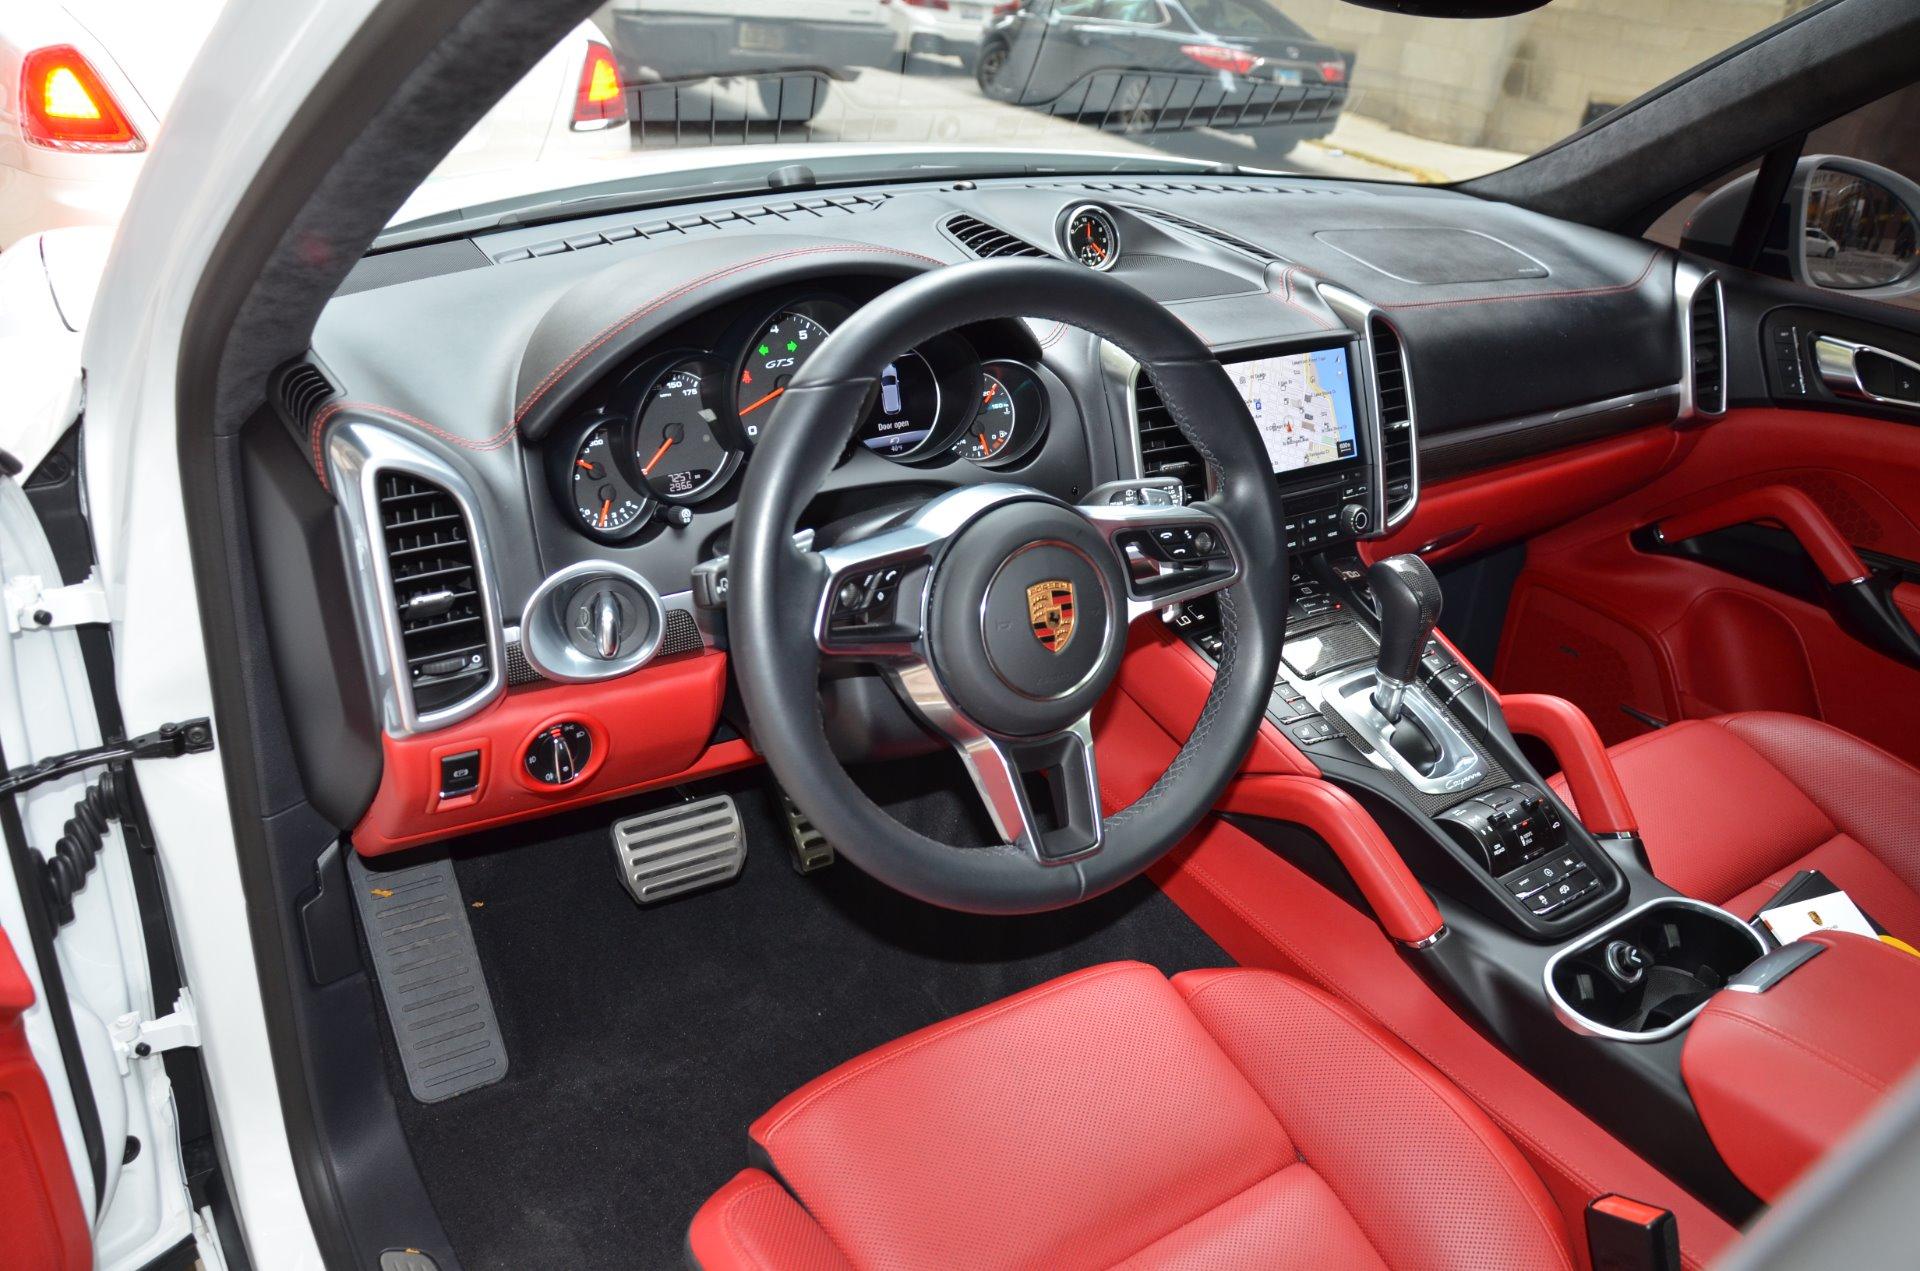 2017 Porsche Cayenne Gts Stock L304c For Sale Near Chicago Il Il Porsche Dealer